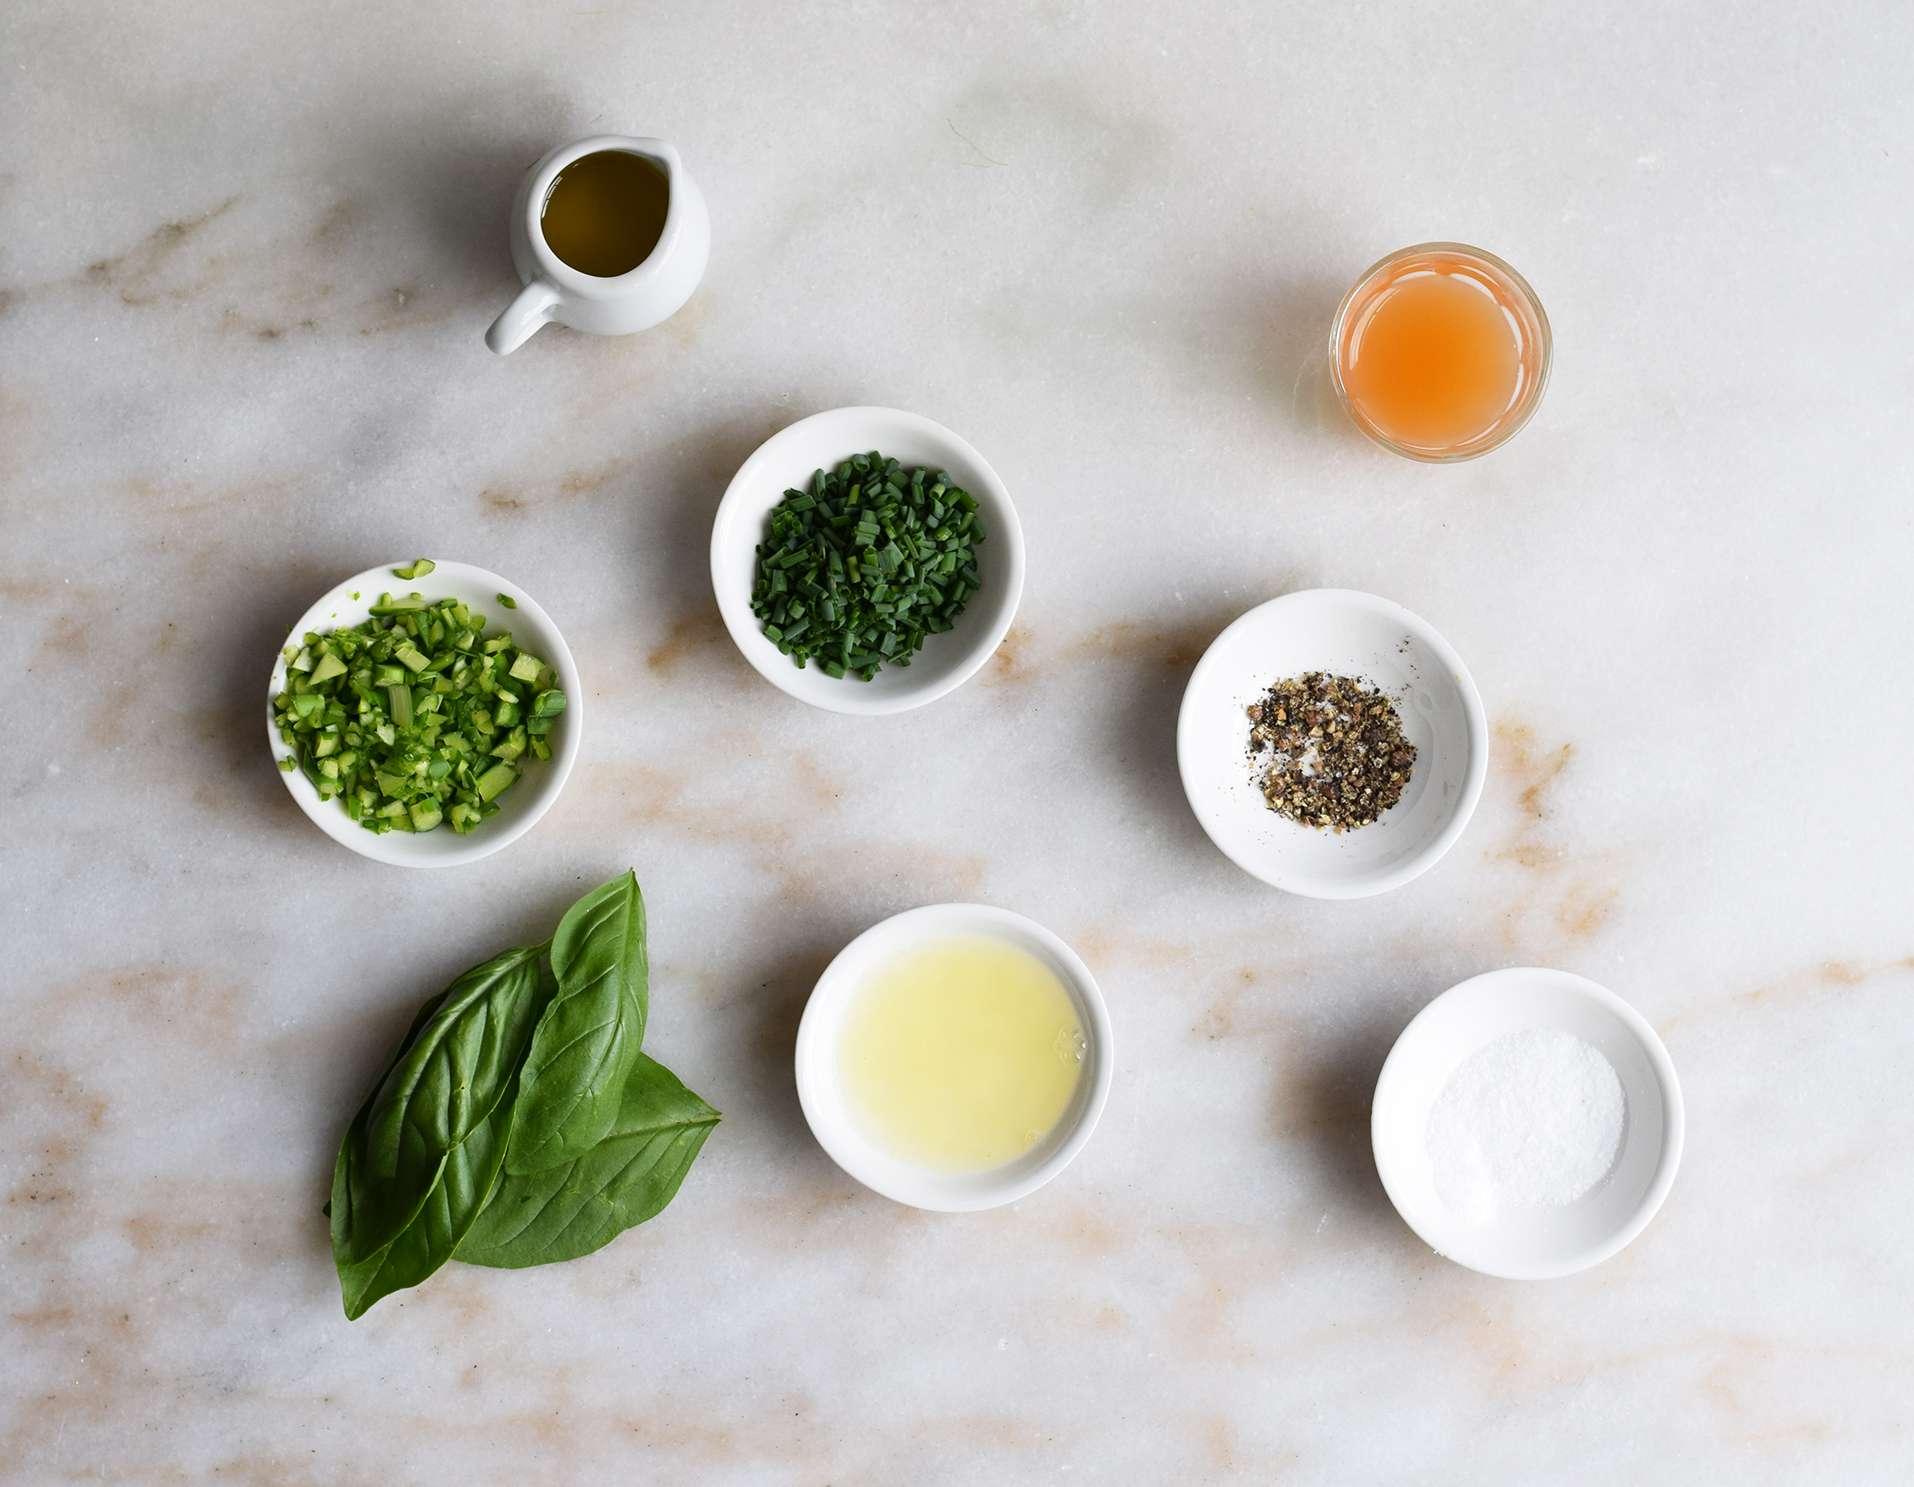 grilled corn salad dressing ingredients